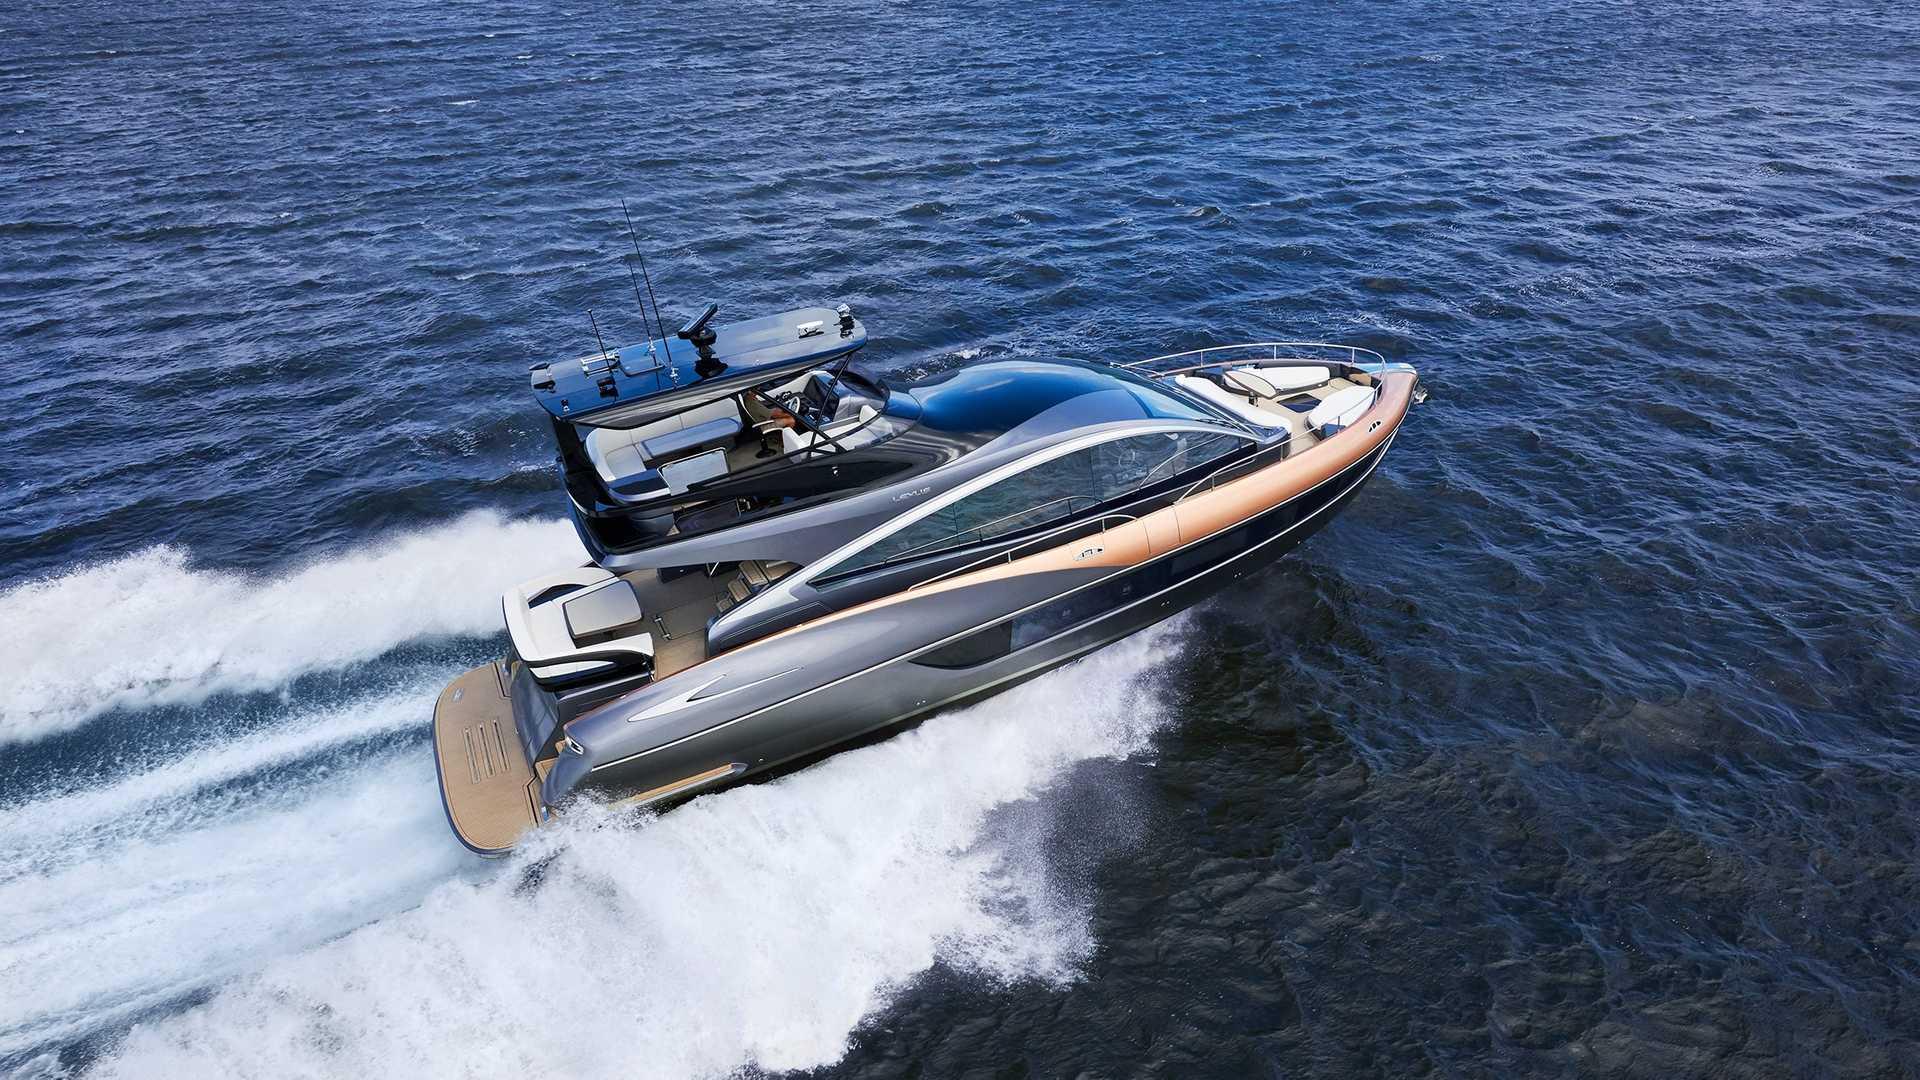 Lexus-LY-650-Yacht-8